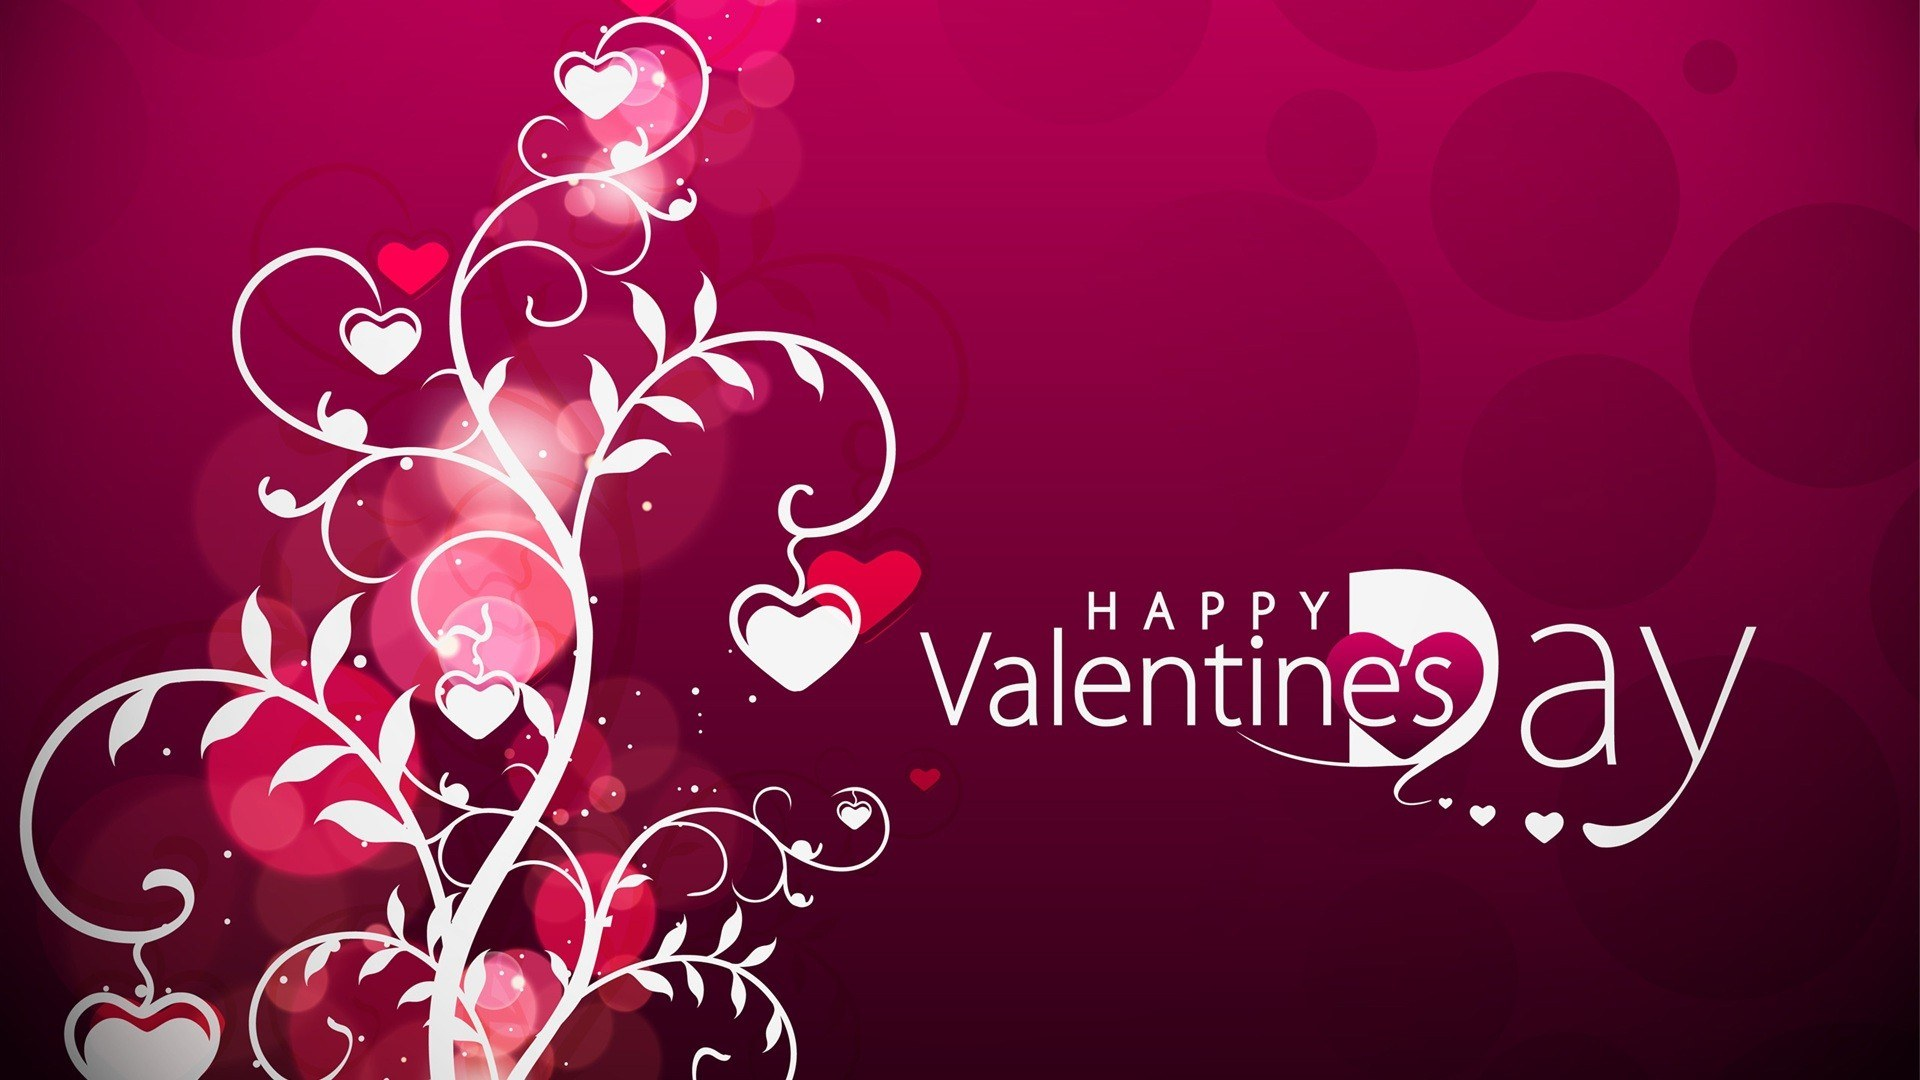 Happy-Valentines-Day-Wallpaper